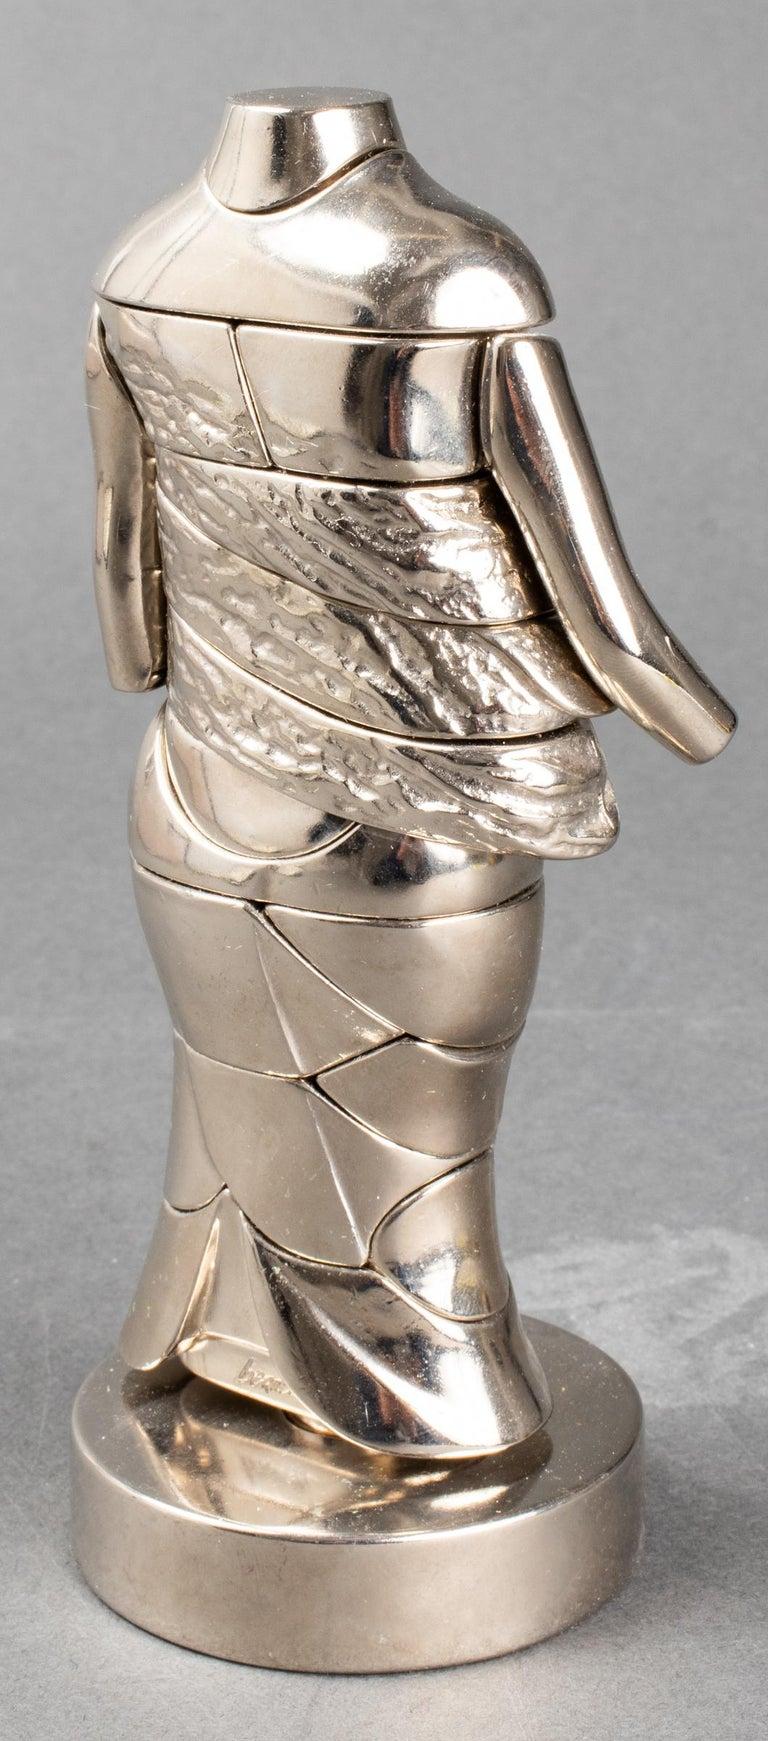 European Miguel Ortiz Berrocal La Mini Cariatide Puzzle Sculpture For Sale